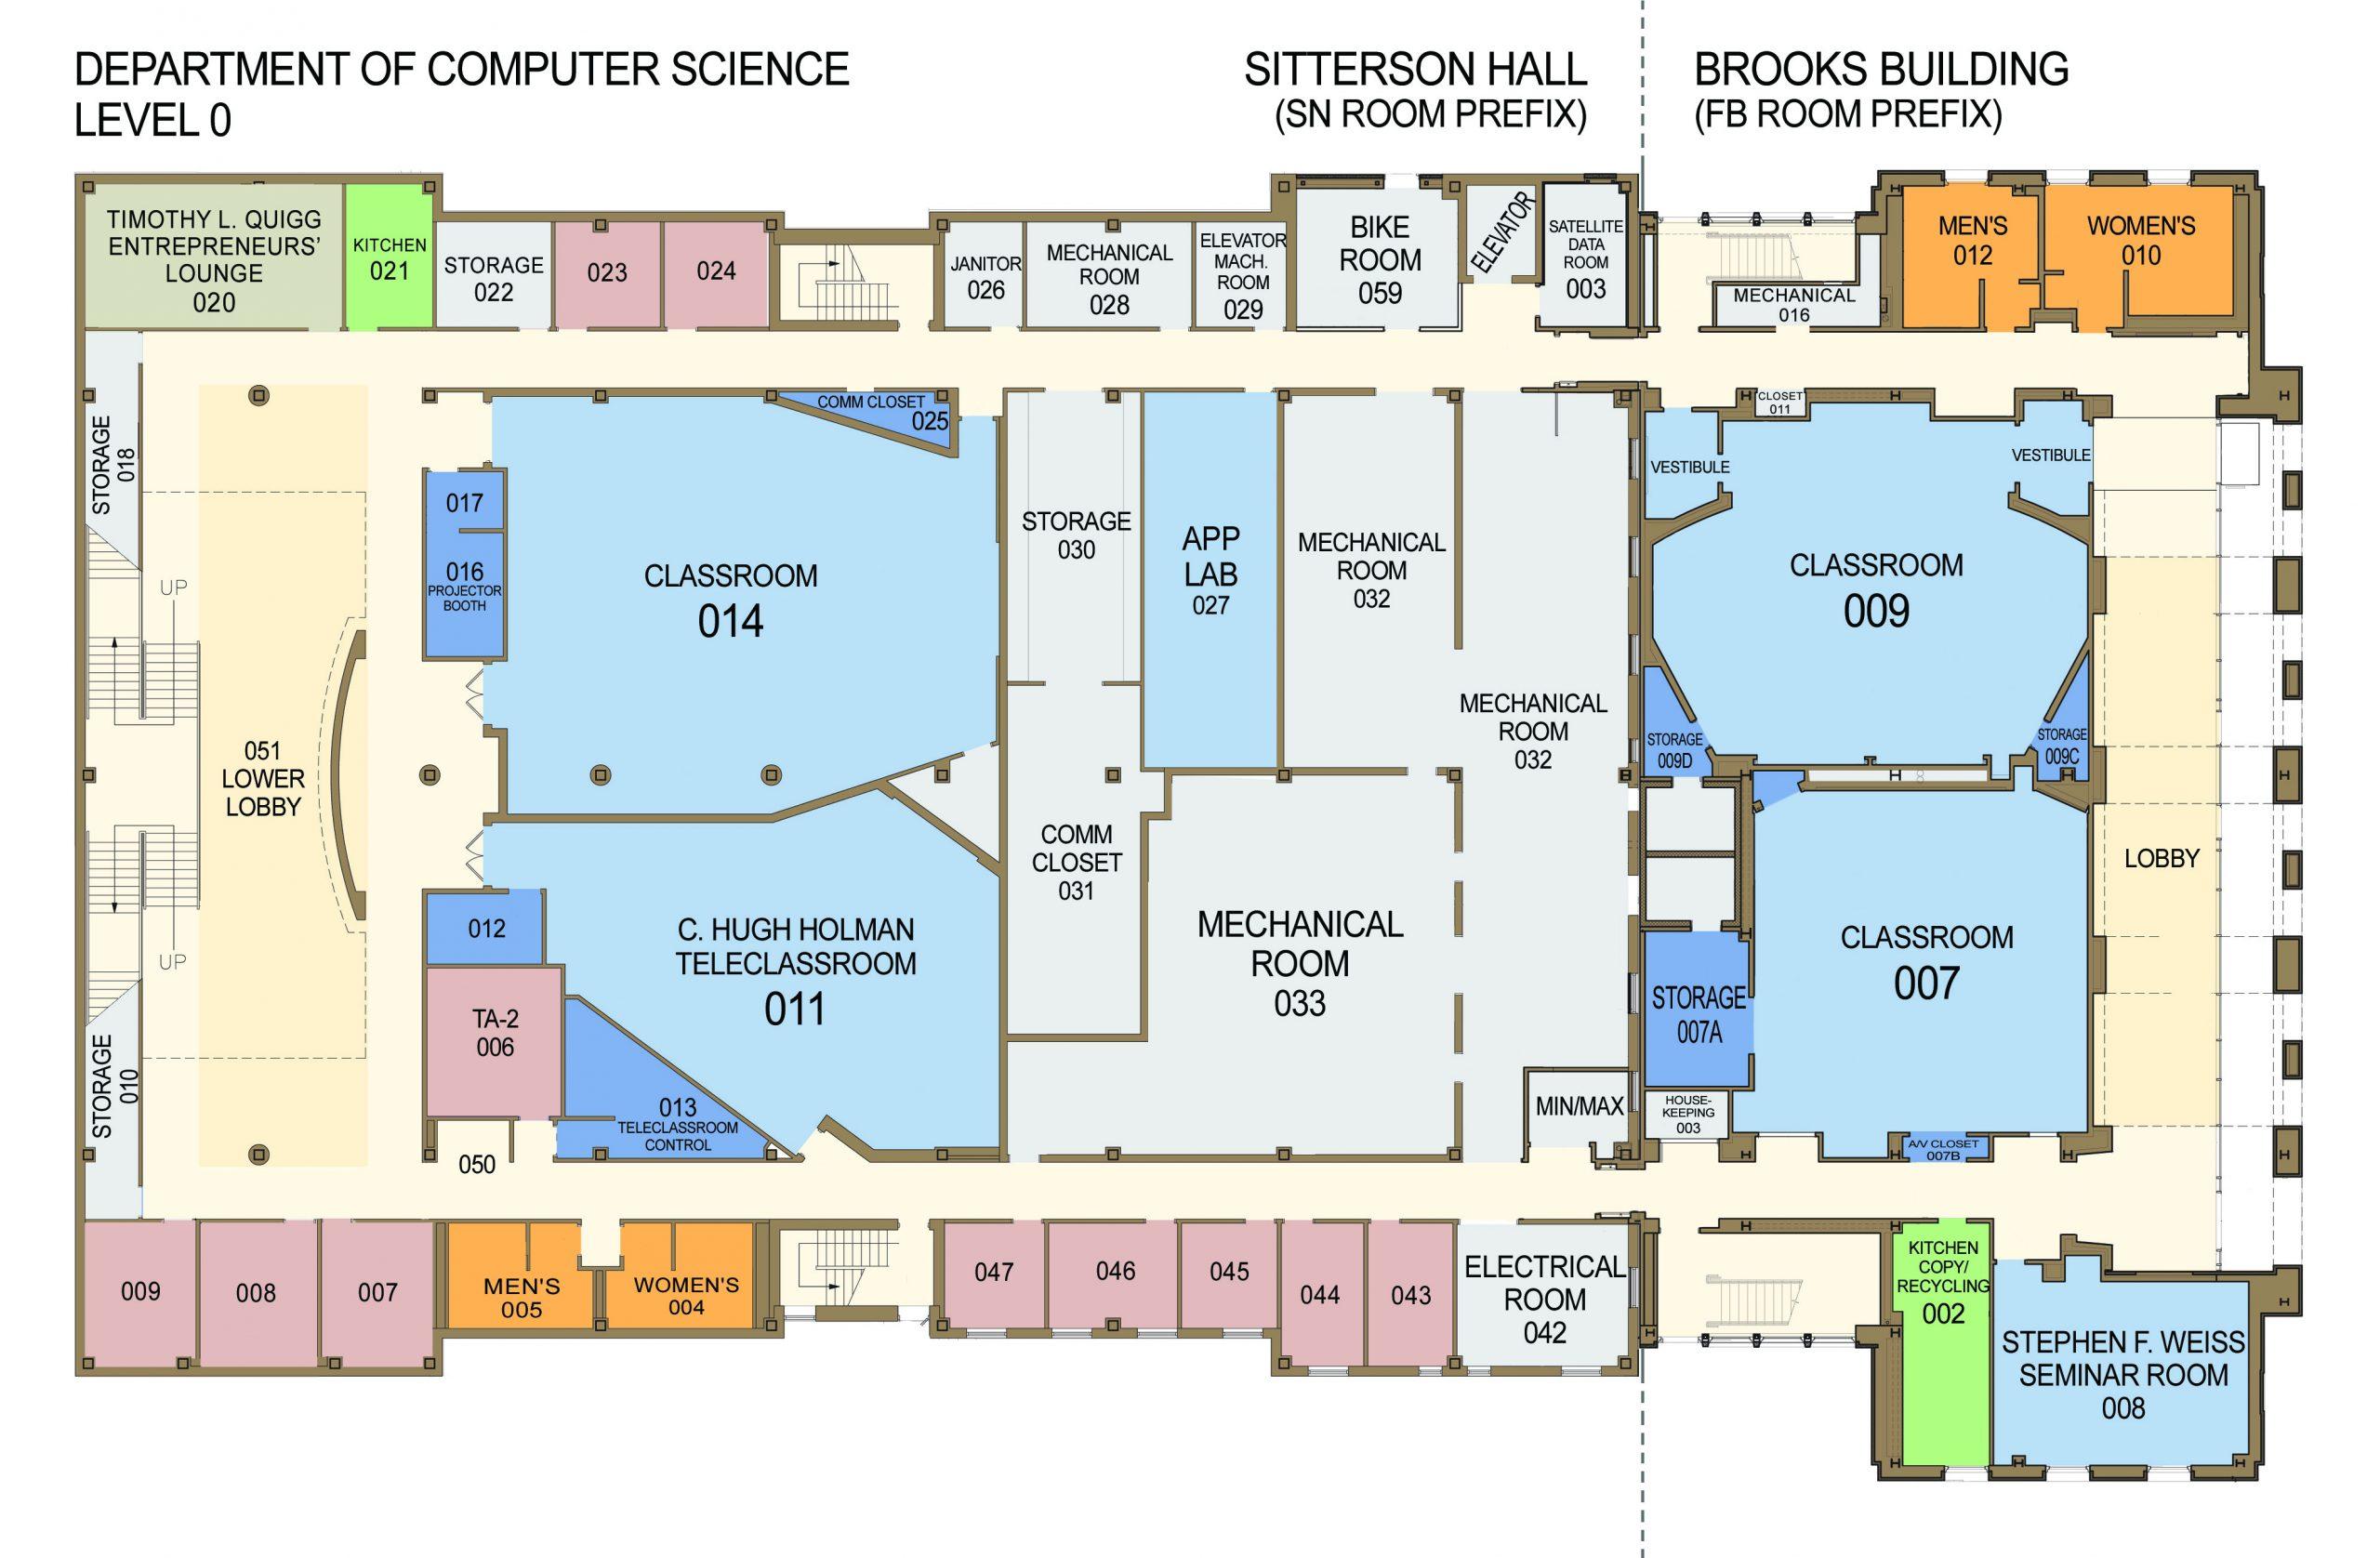 Level 0 Floor Plan, Sitterson Hall & Brooks Bldg